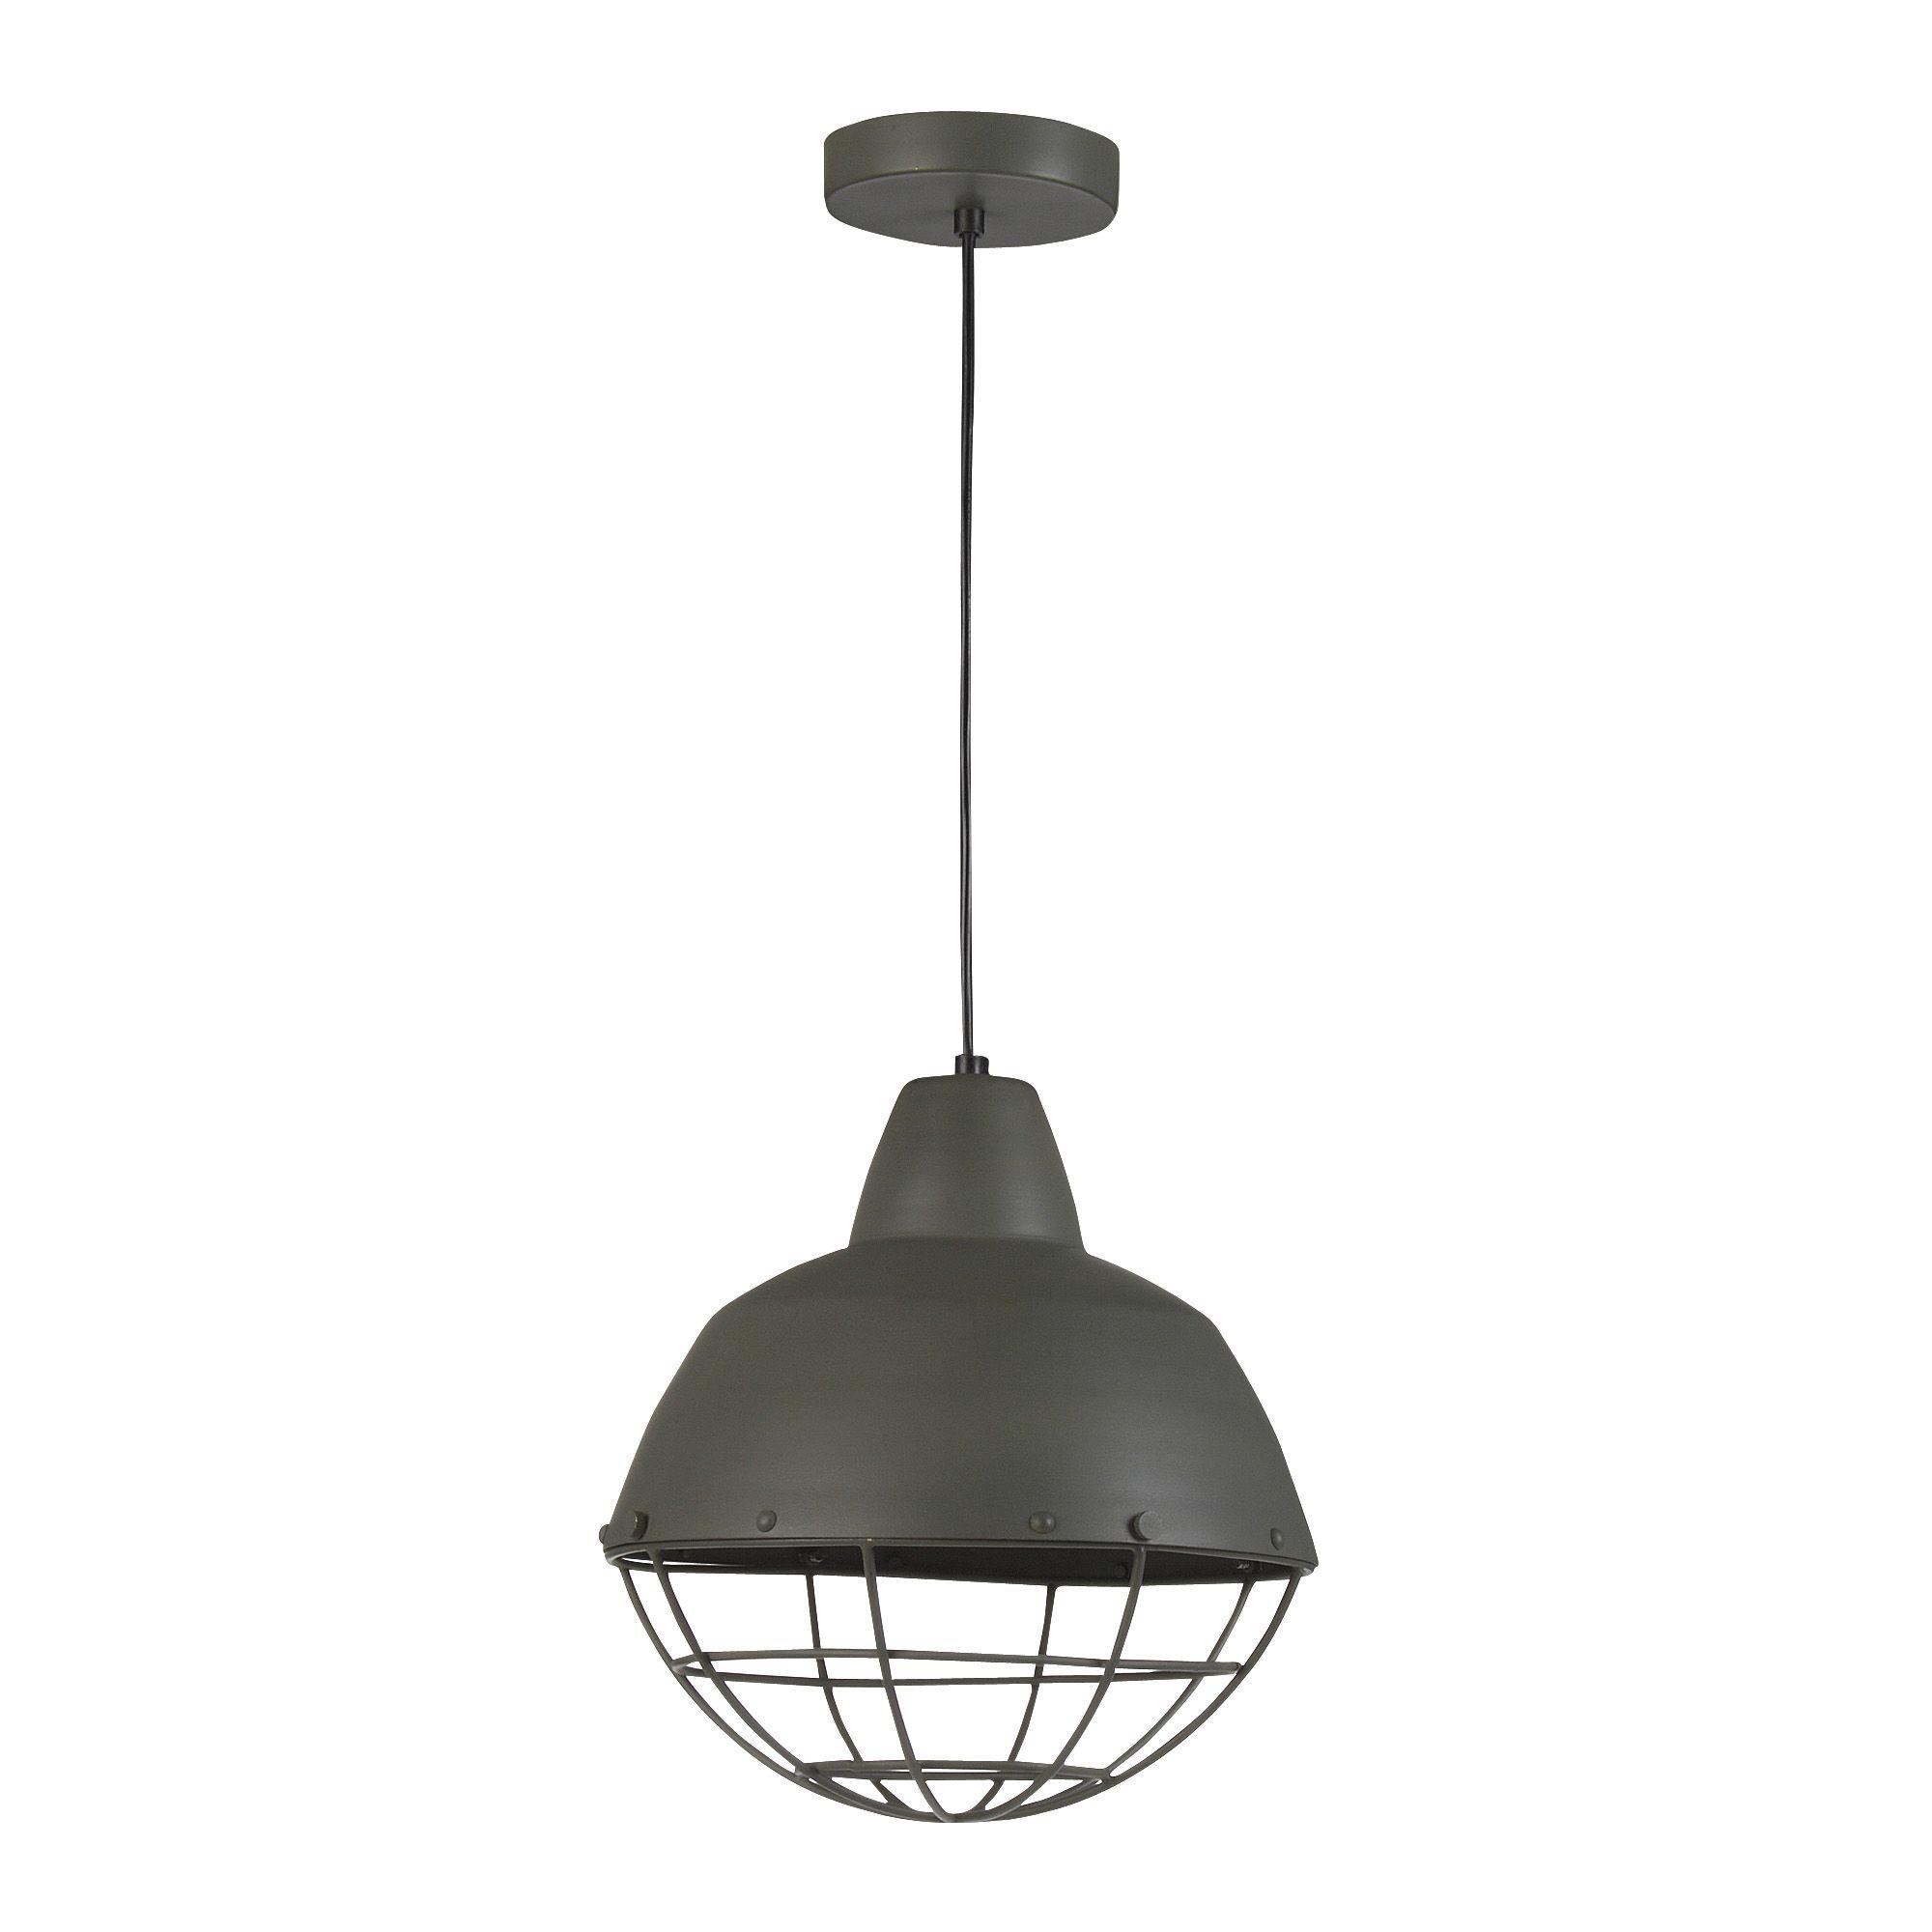 suspension moderne alu gris d27cm gris phare les suspensions et lustres luminaires salon. Black Bedroom Furniture Sets. Home Design Ideas